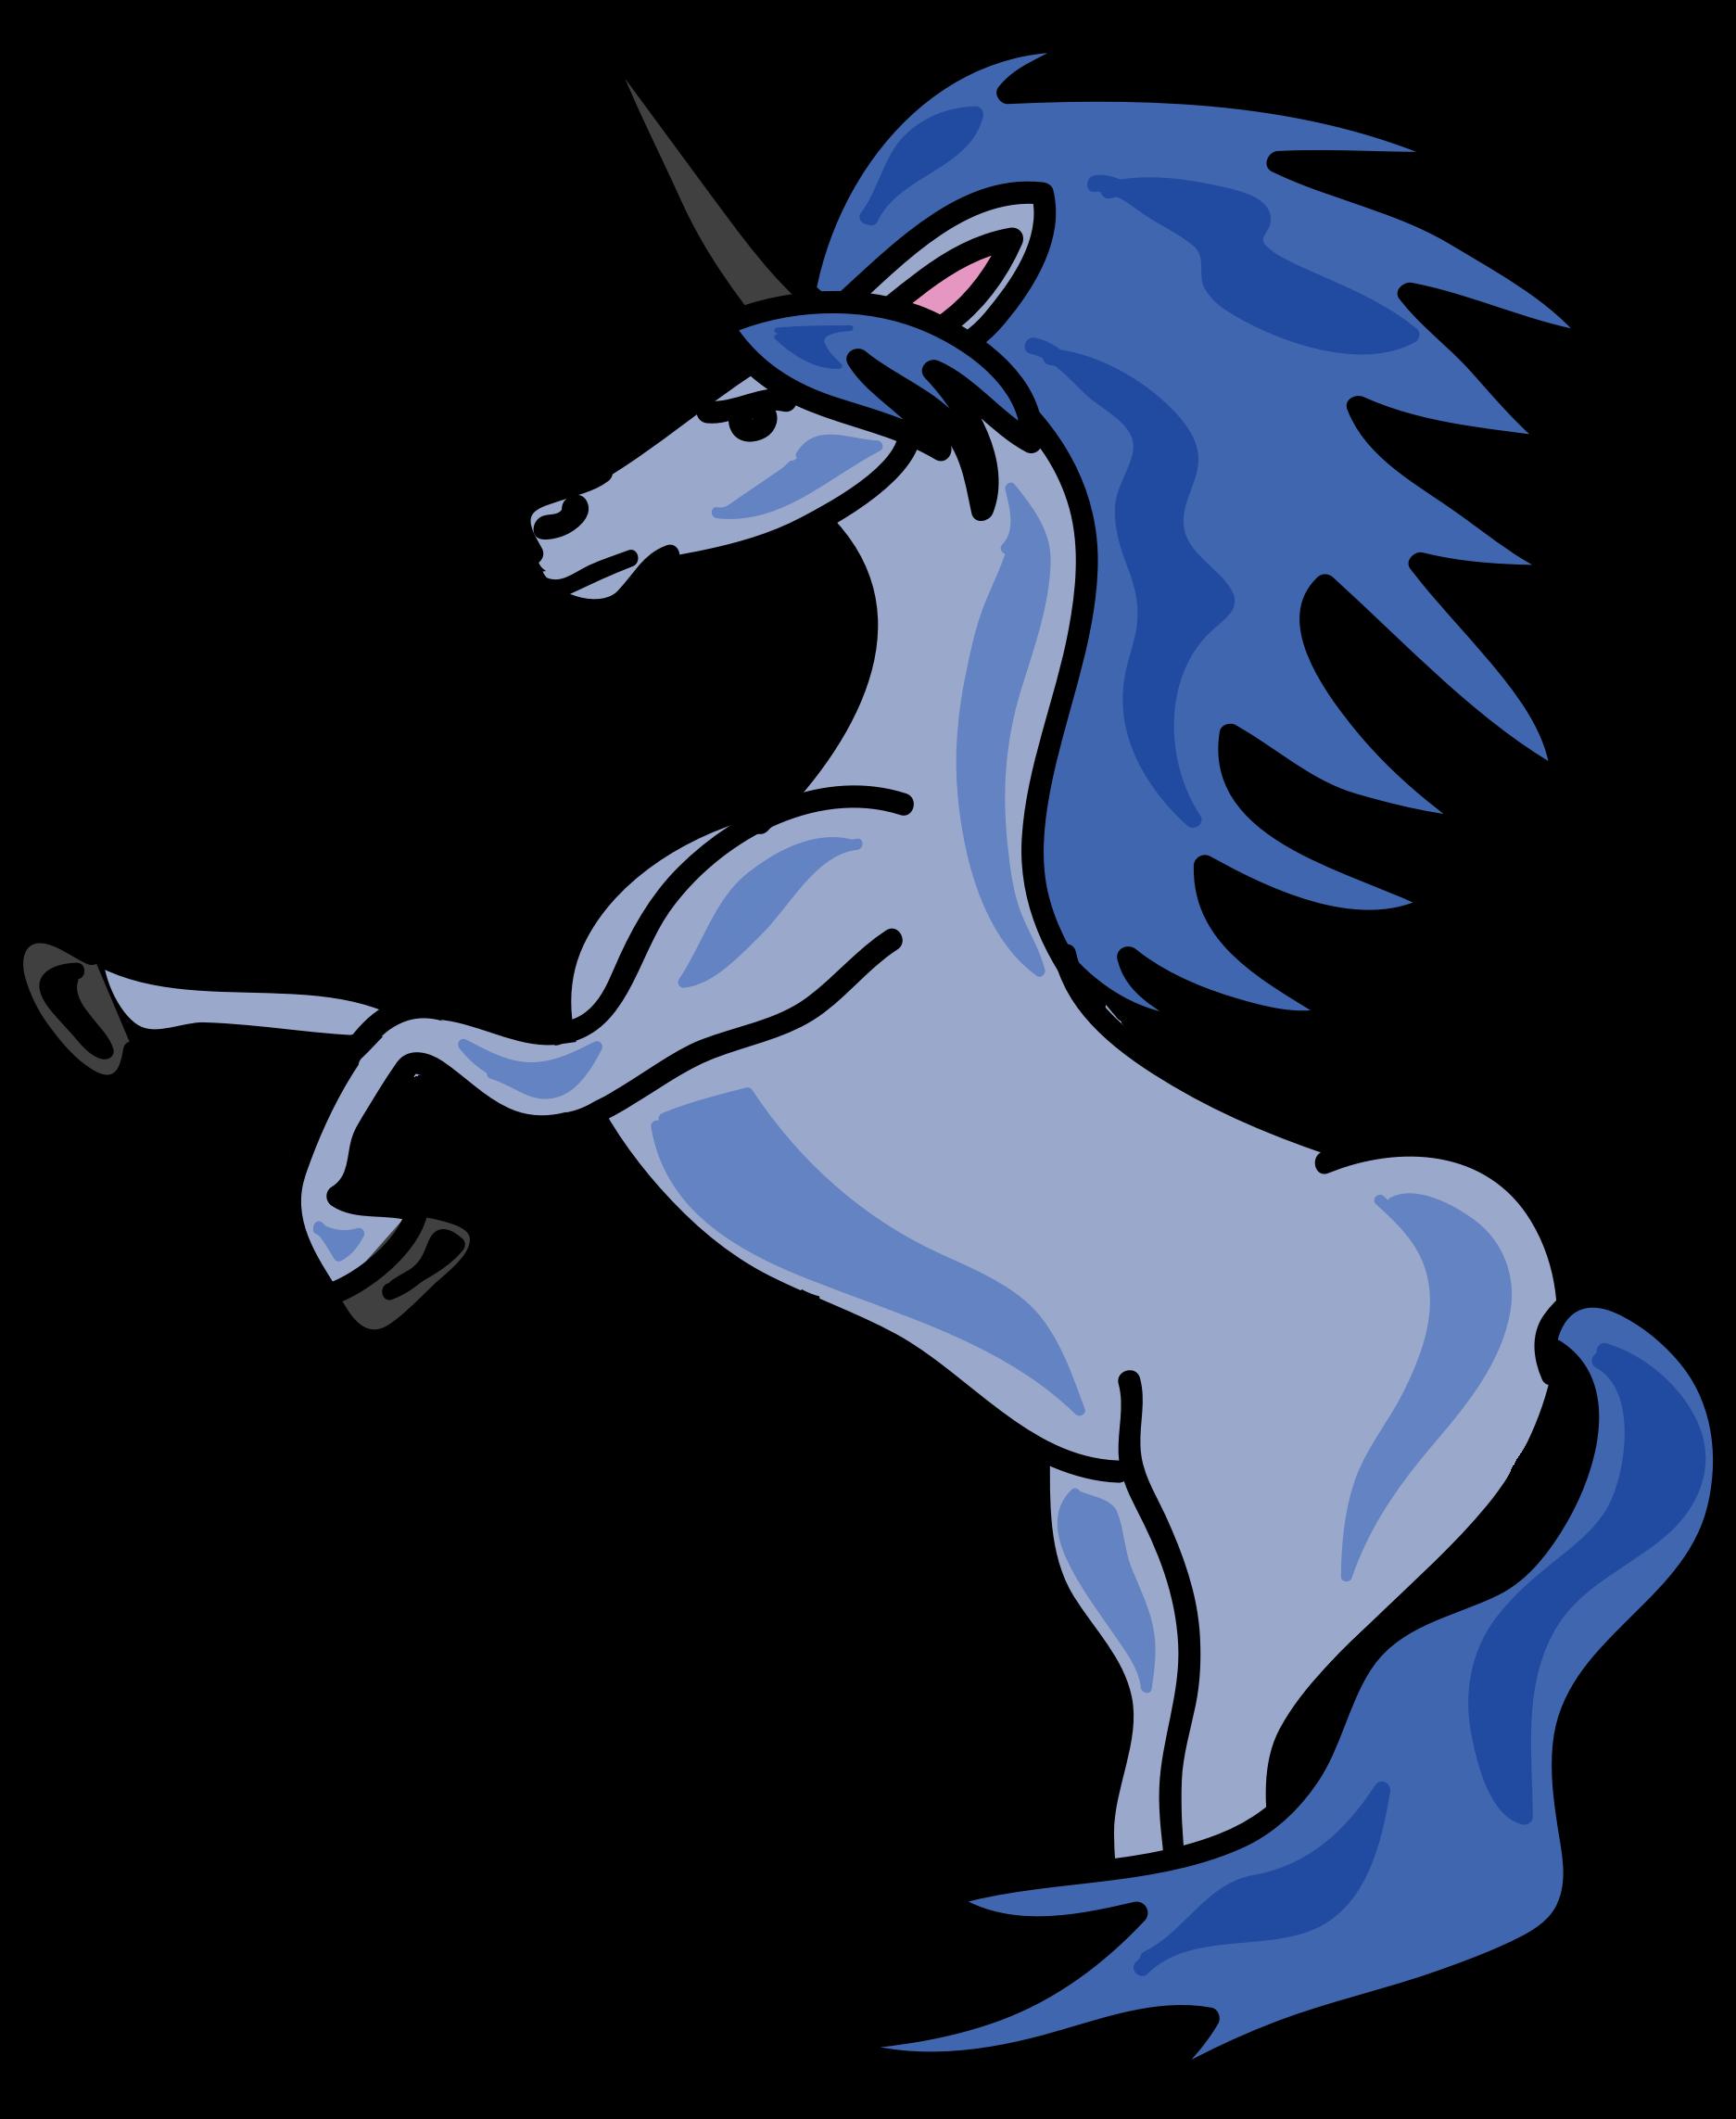 Blue clipart unicorn. Big image png